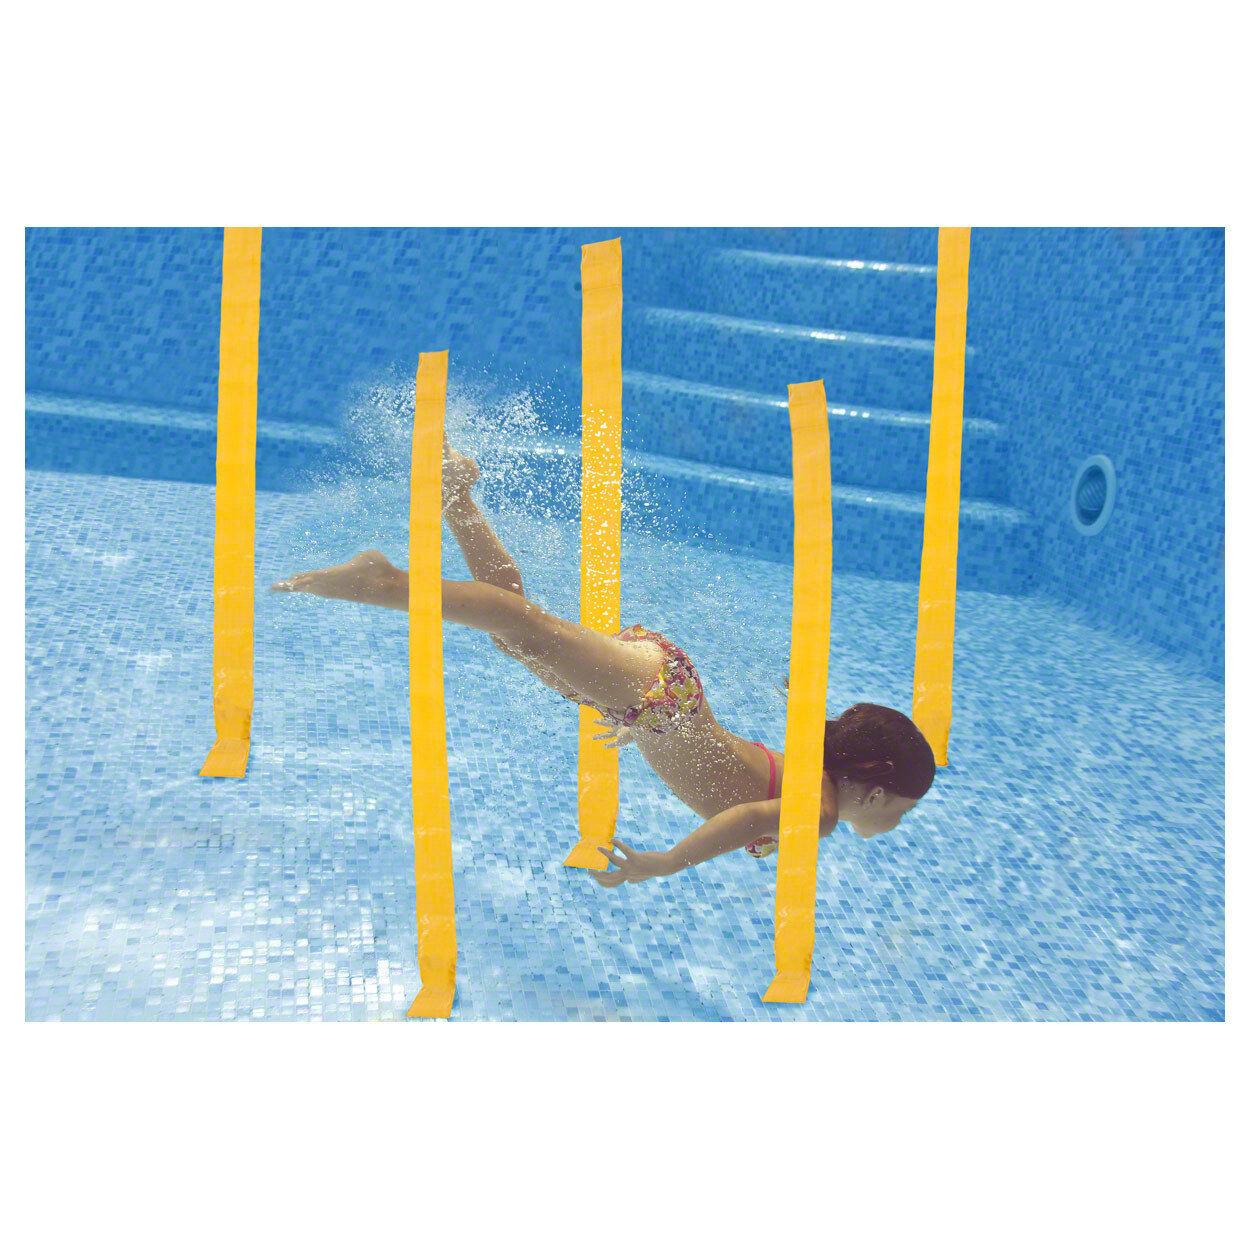 Slalom tauchspiel deportes acuáticos tauchsport tauchspielzeug juguete juguete juguete acuático, 136 pp. 1a3c25